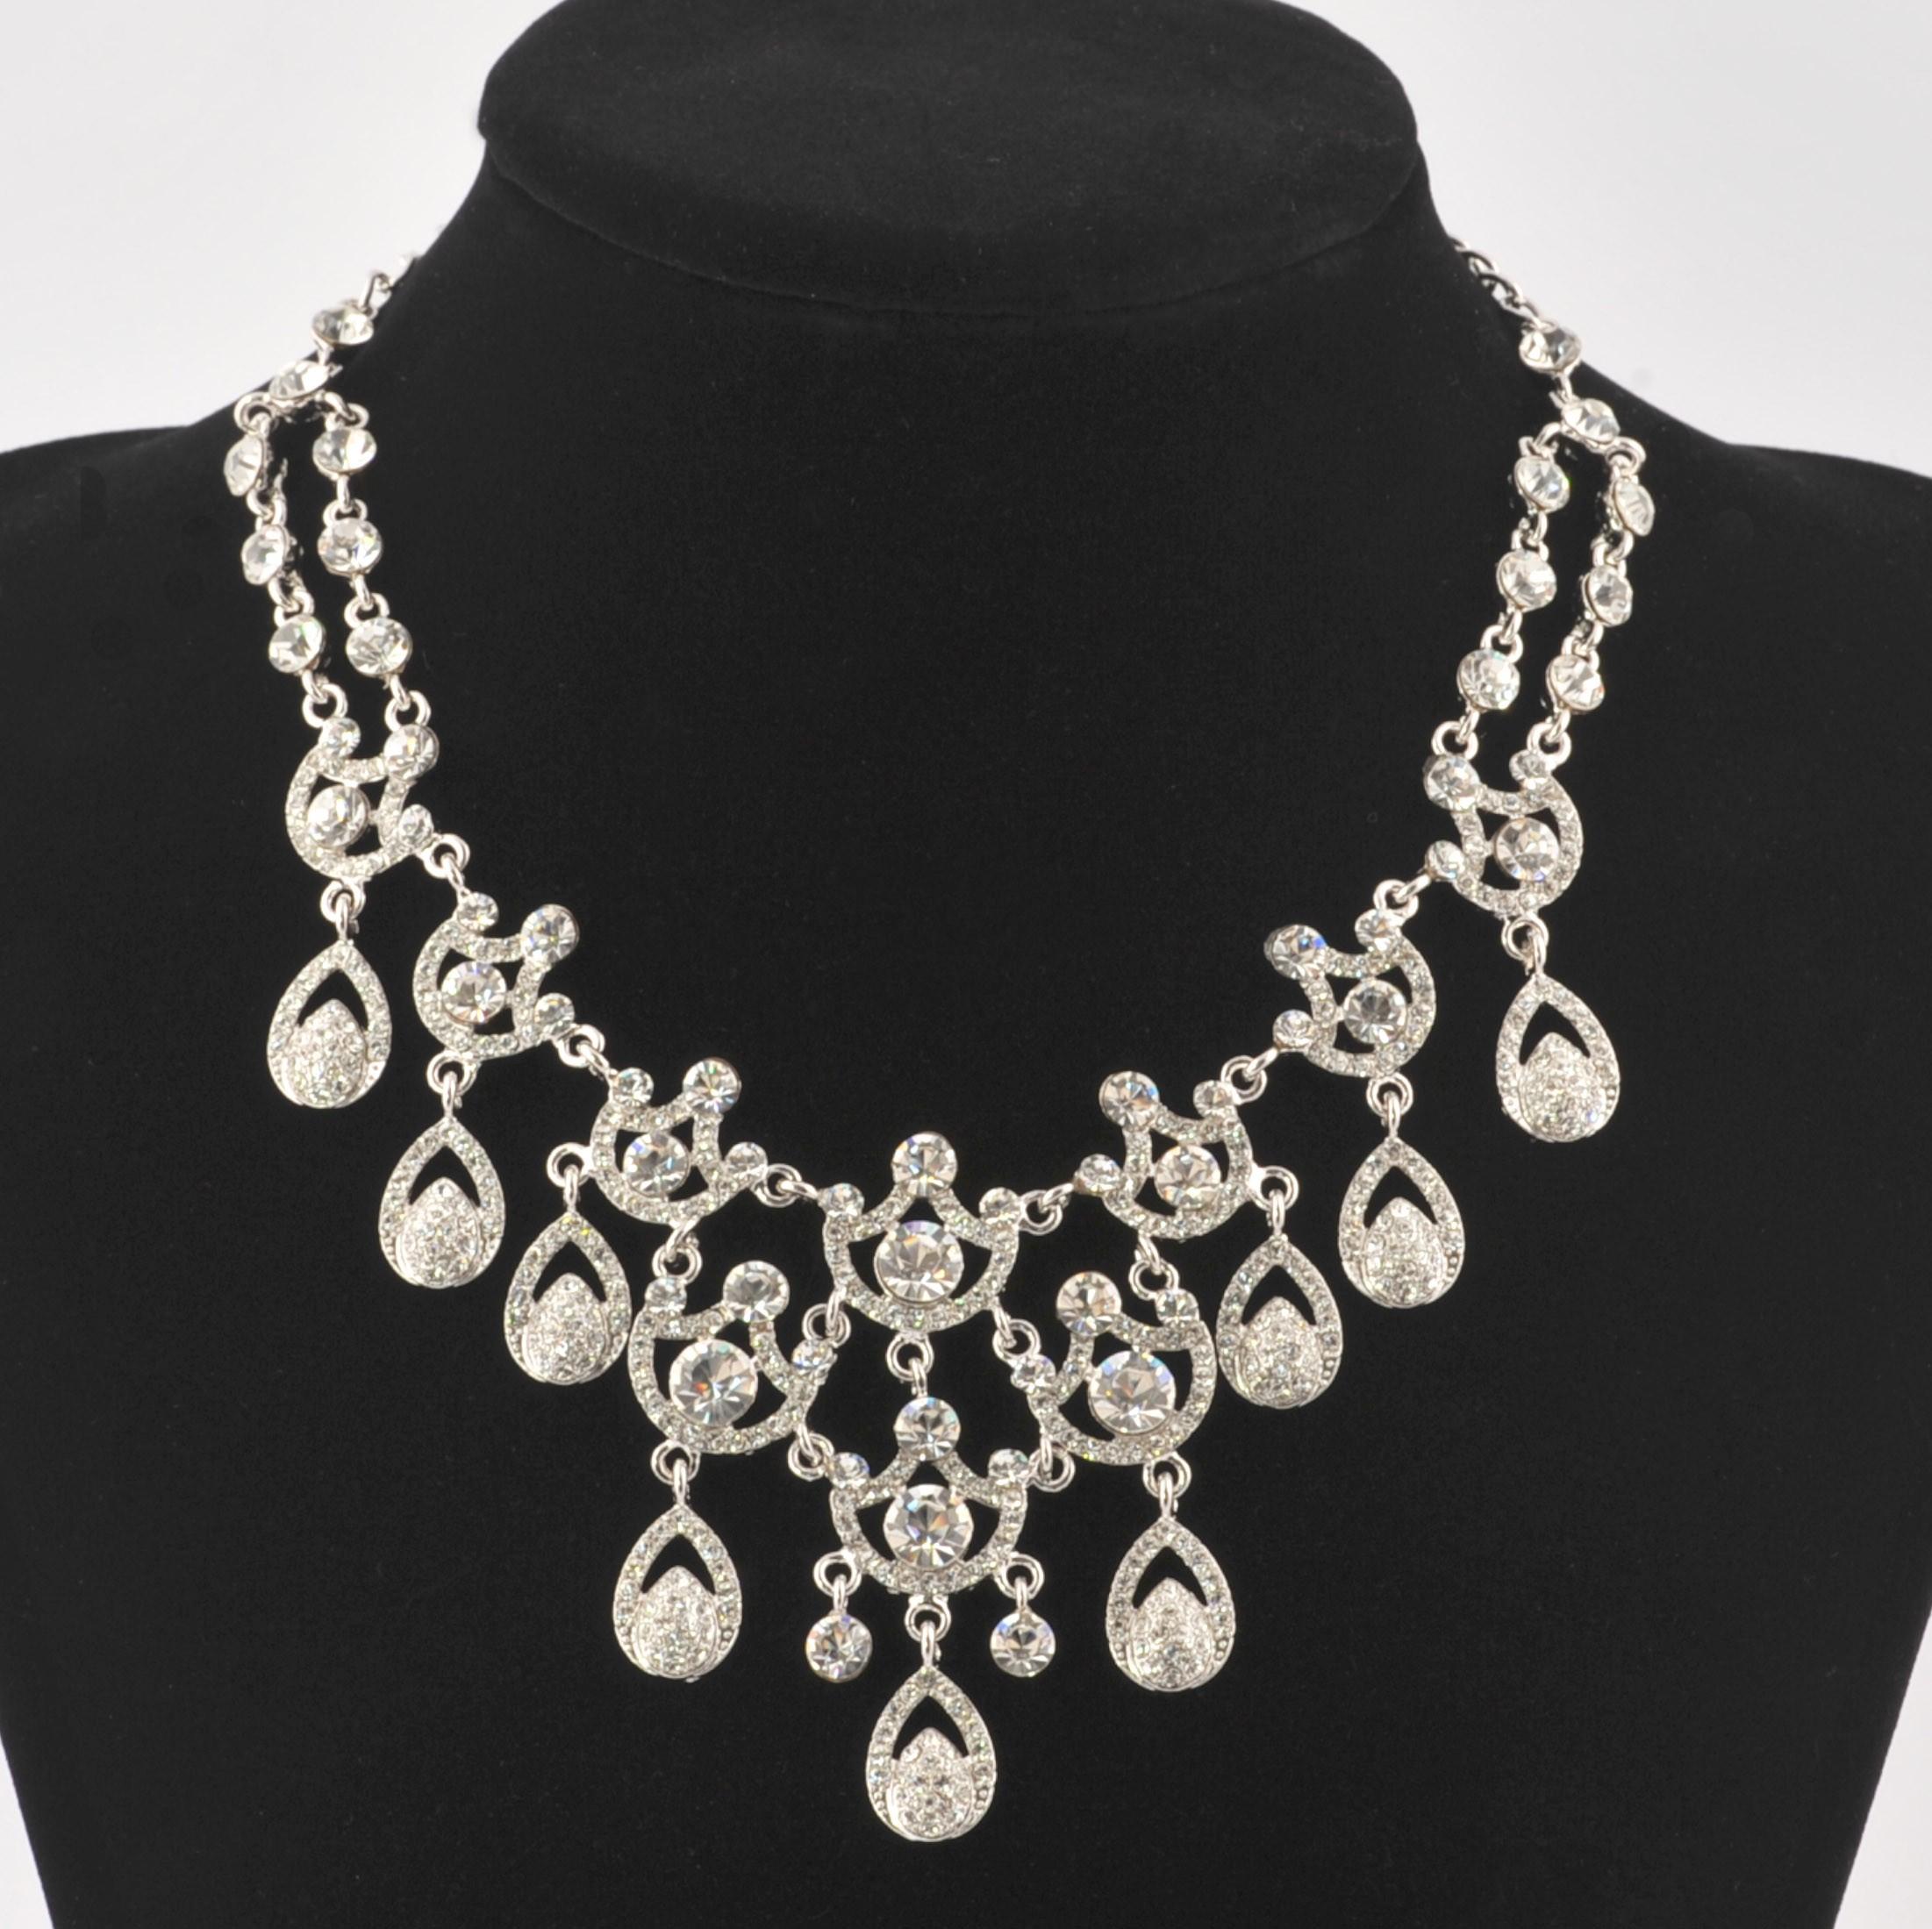 Swarovski Crystal Clear Crystal Necklace 9 Ornate